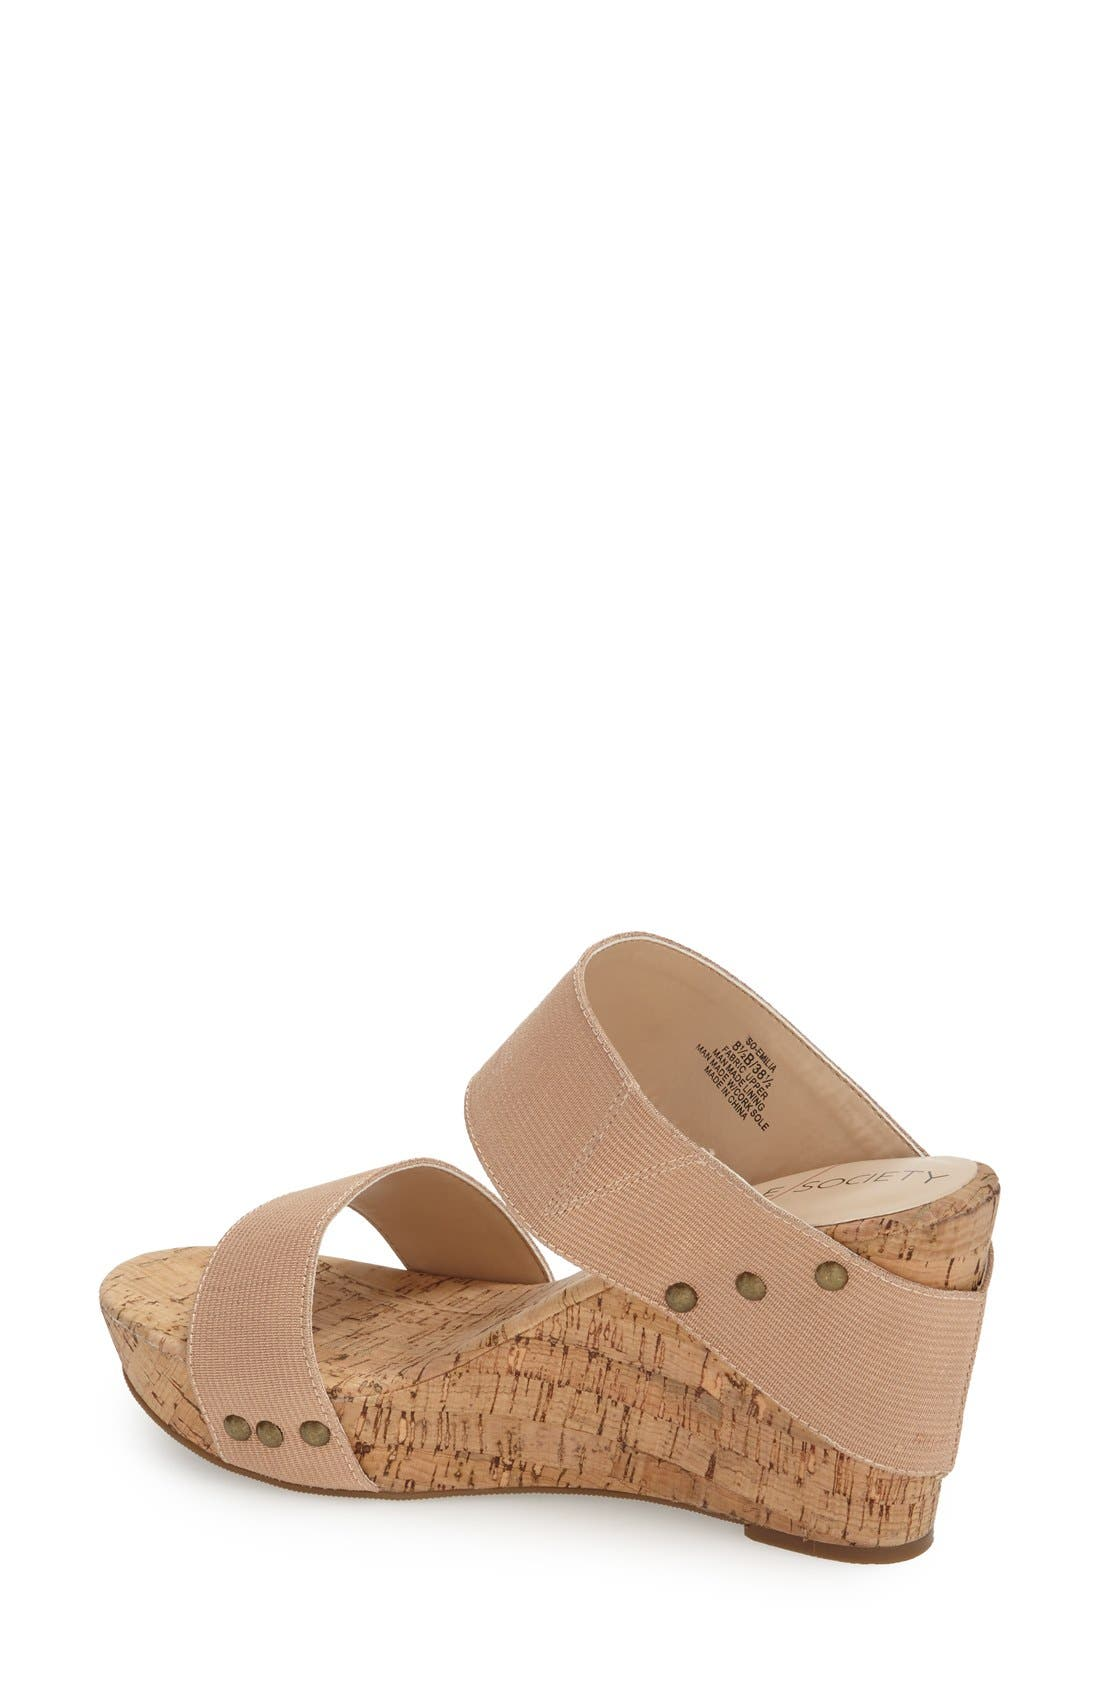 'Emilia 2' Wedge Sandal,                             Alternate thumbnail 12, color,